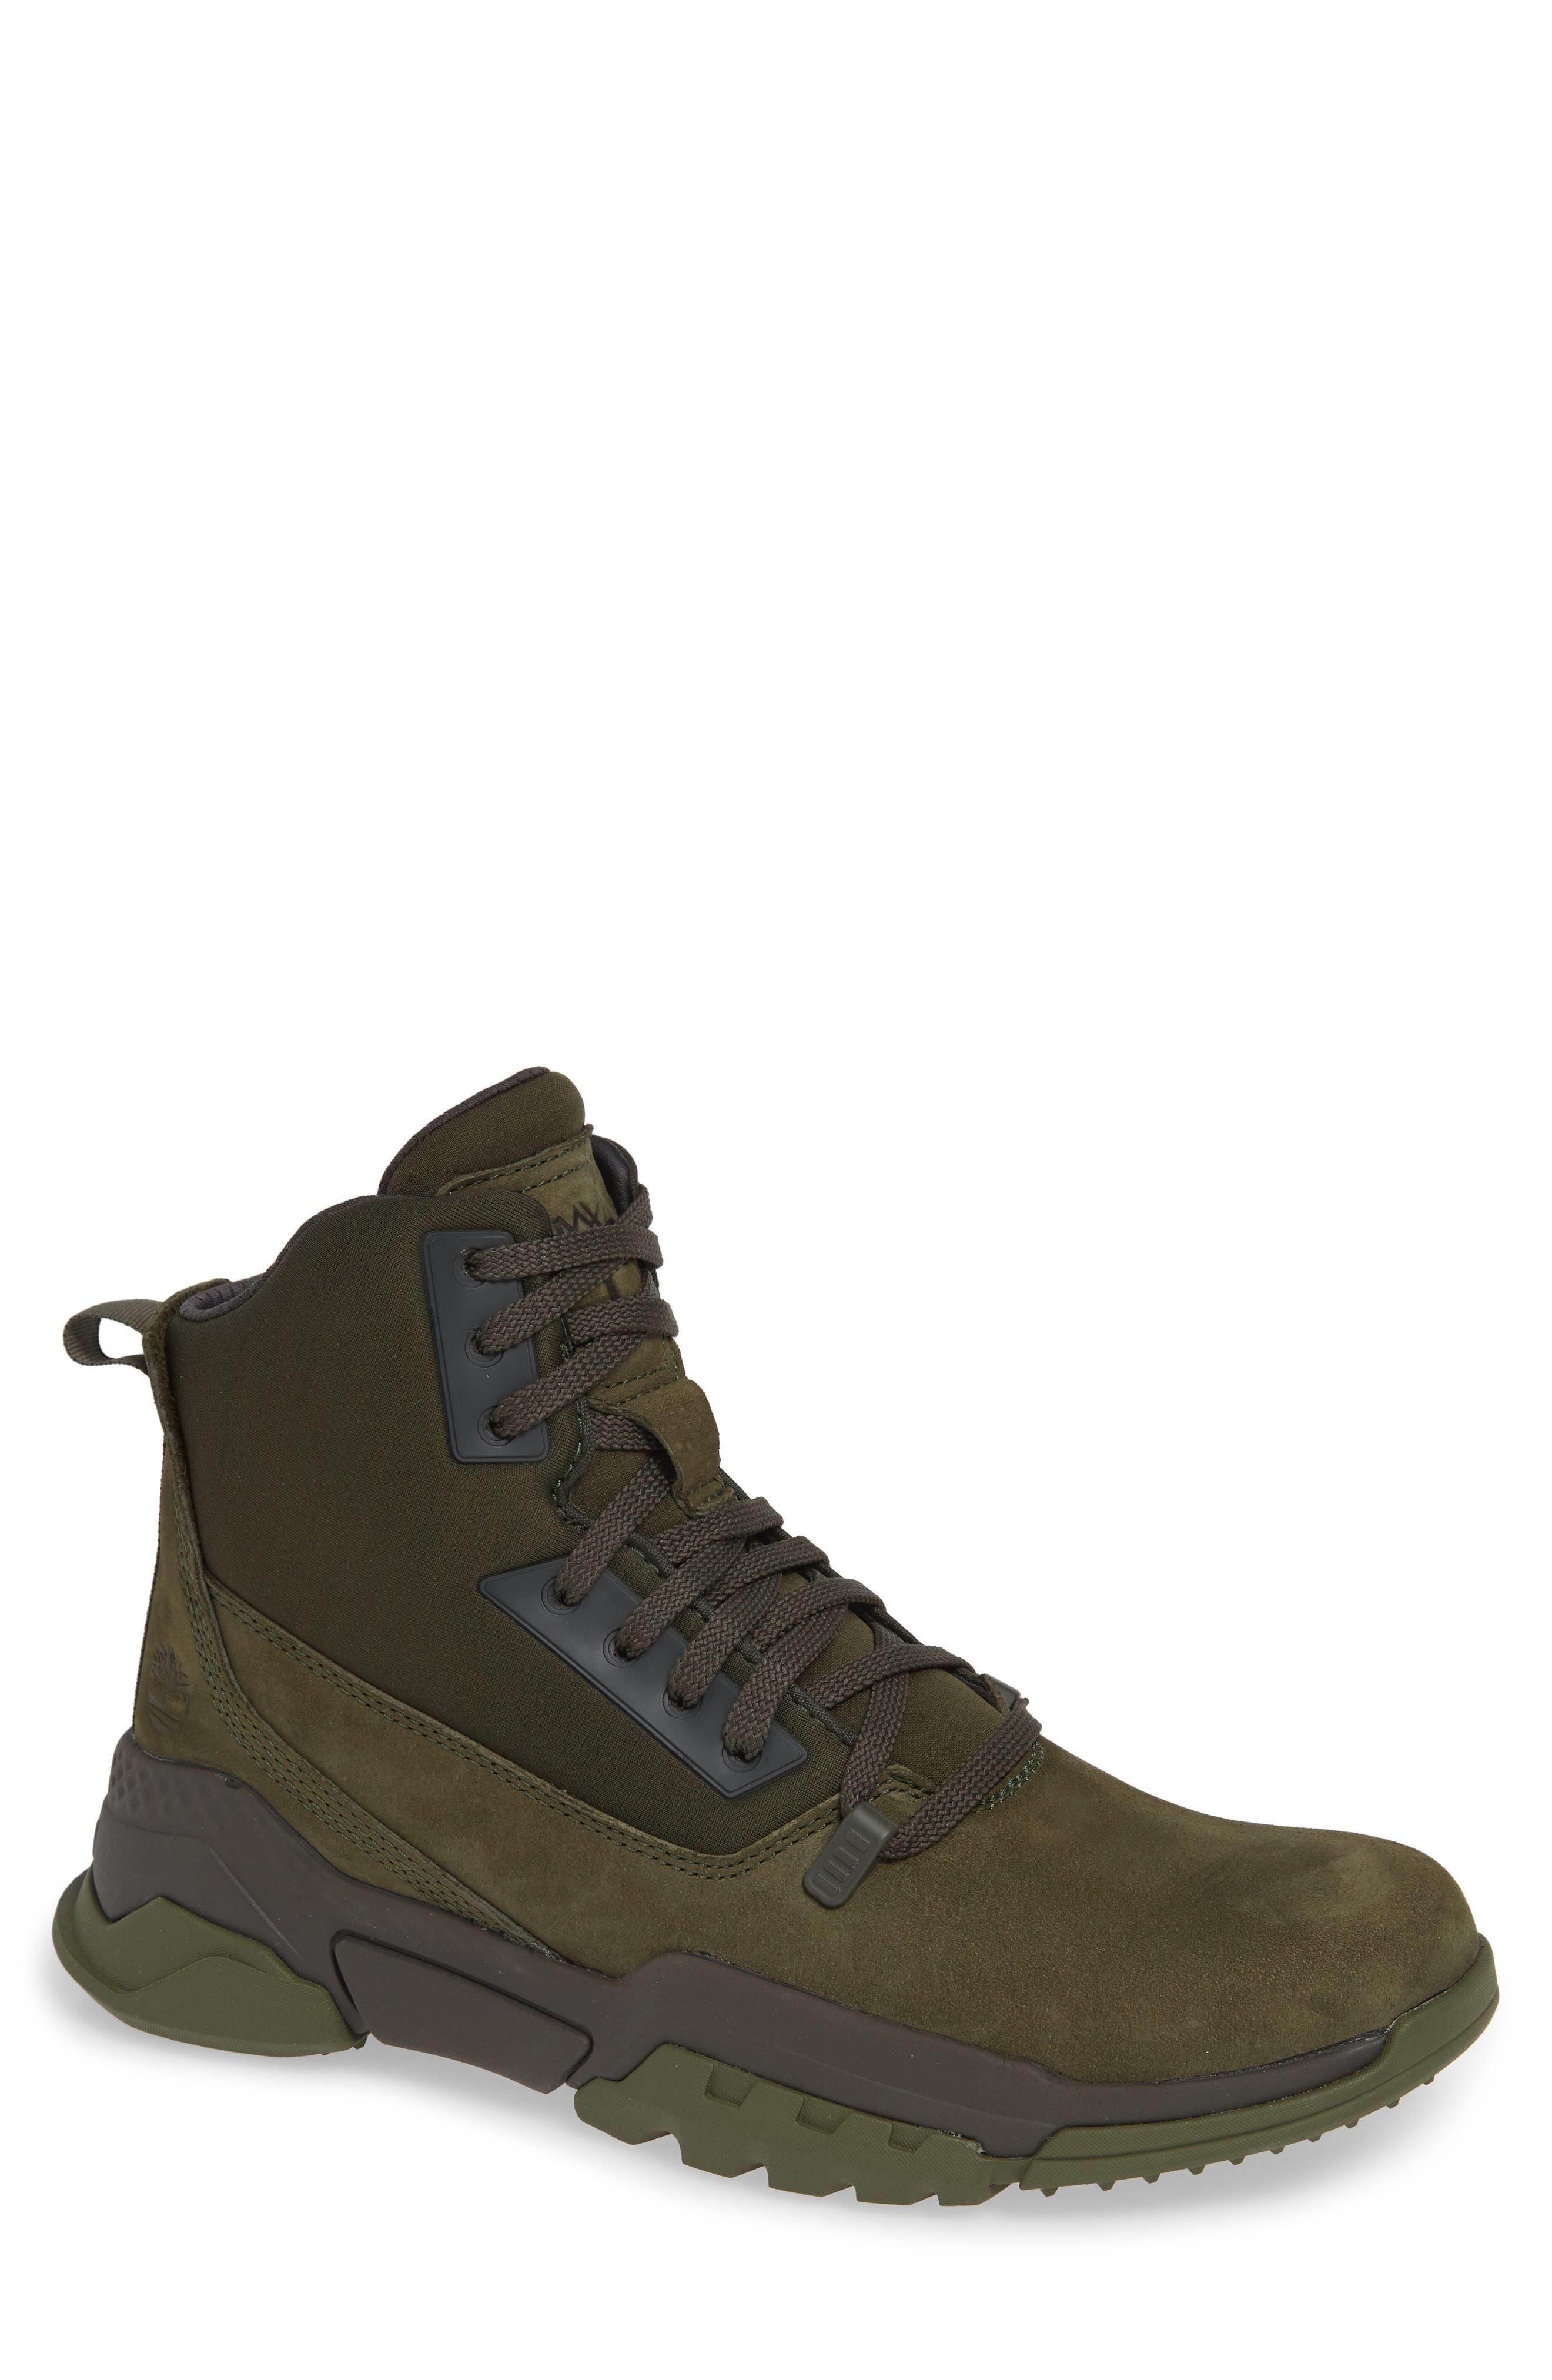 City Force Boot,                             Main thumbnail 1, color,                             GRAPE/ GREY NUBUCK